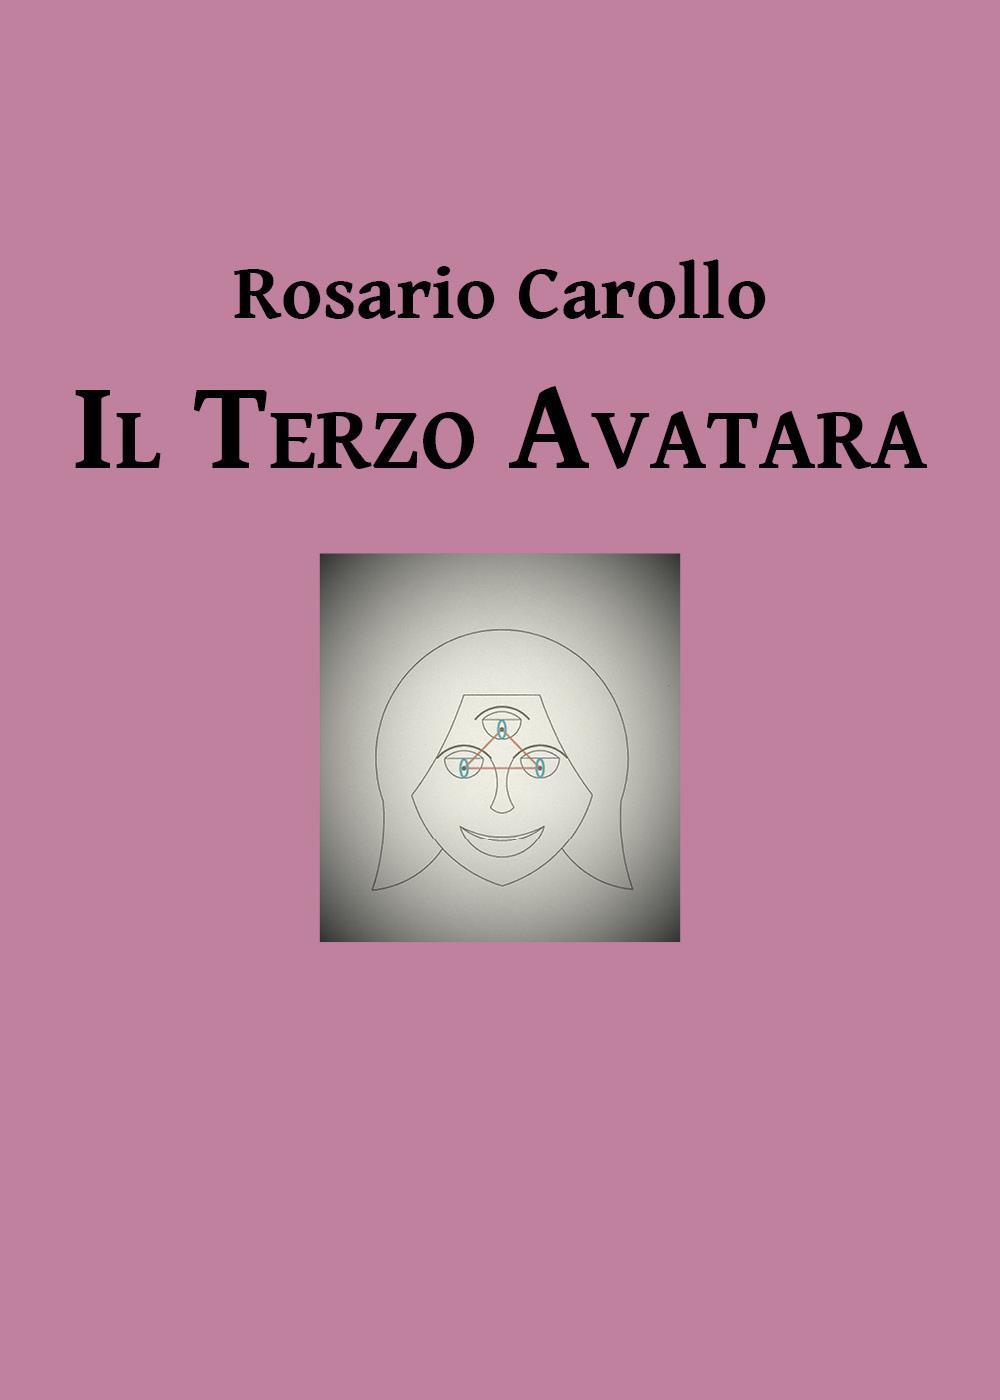 Il terzo avatara